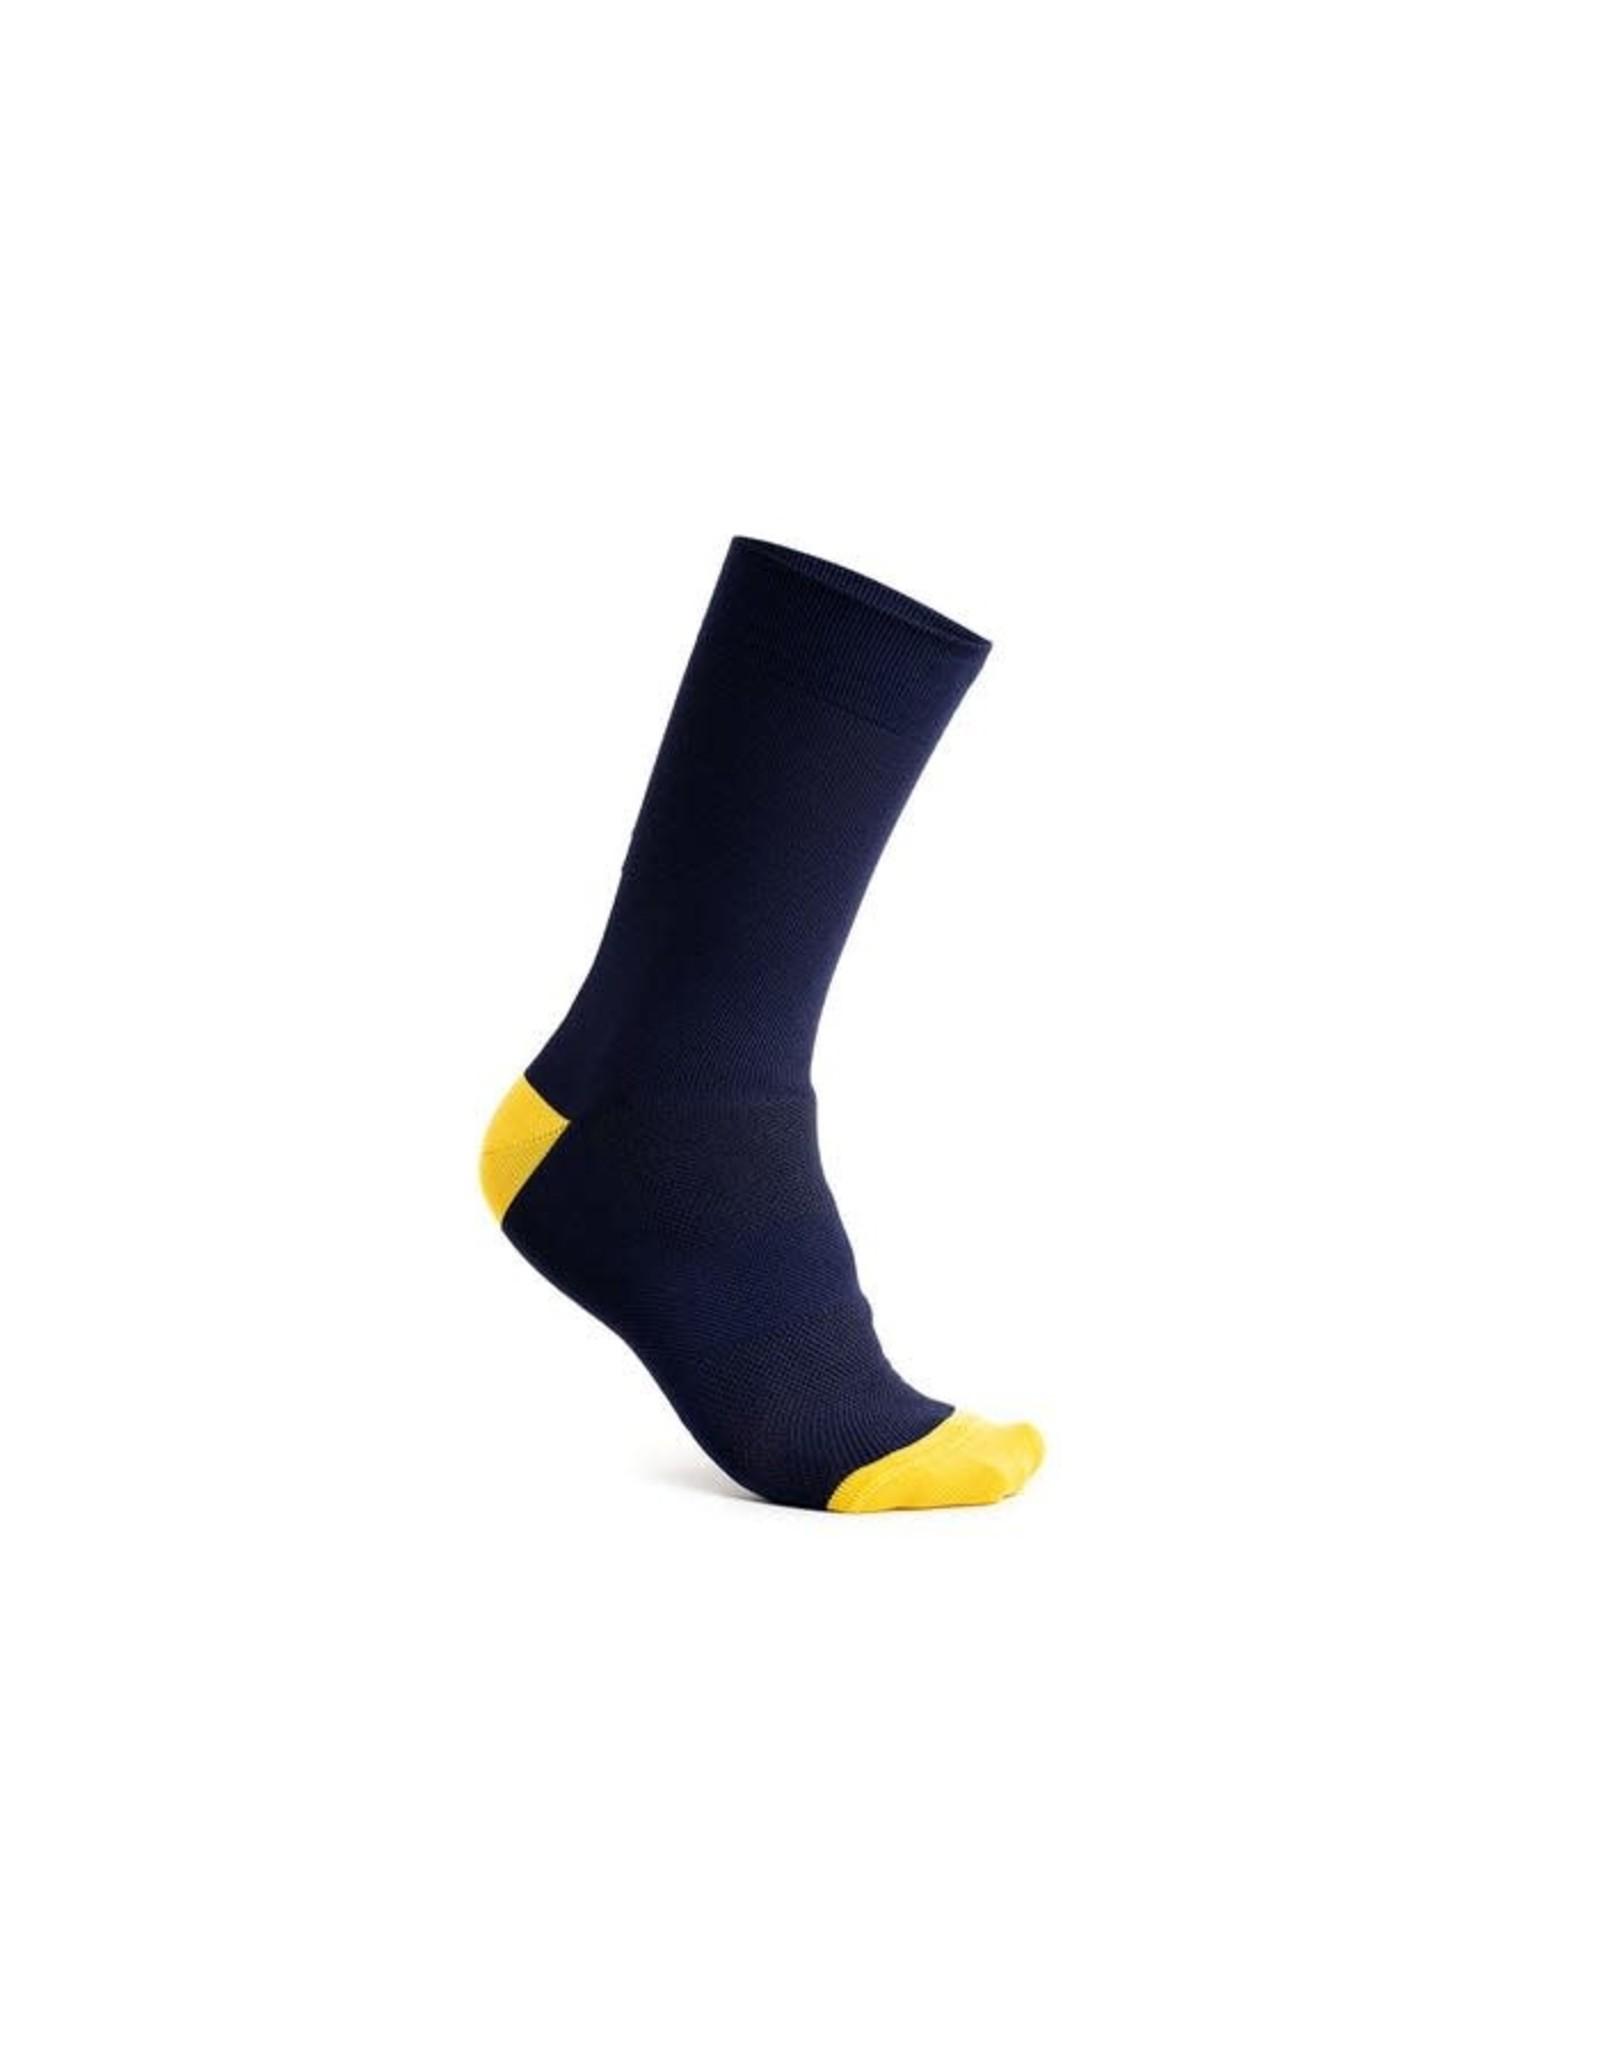 7MESH 7MESH - Word Sock Eclipse Small